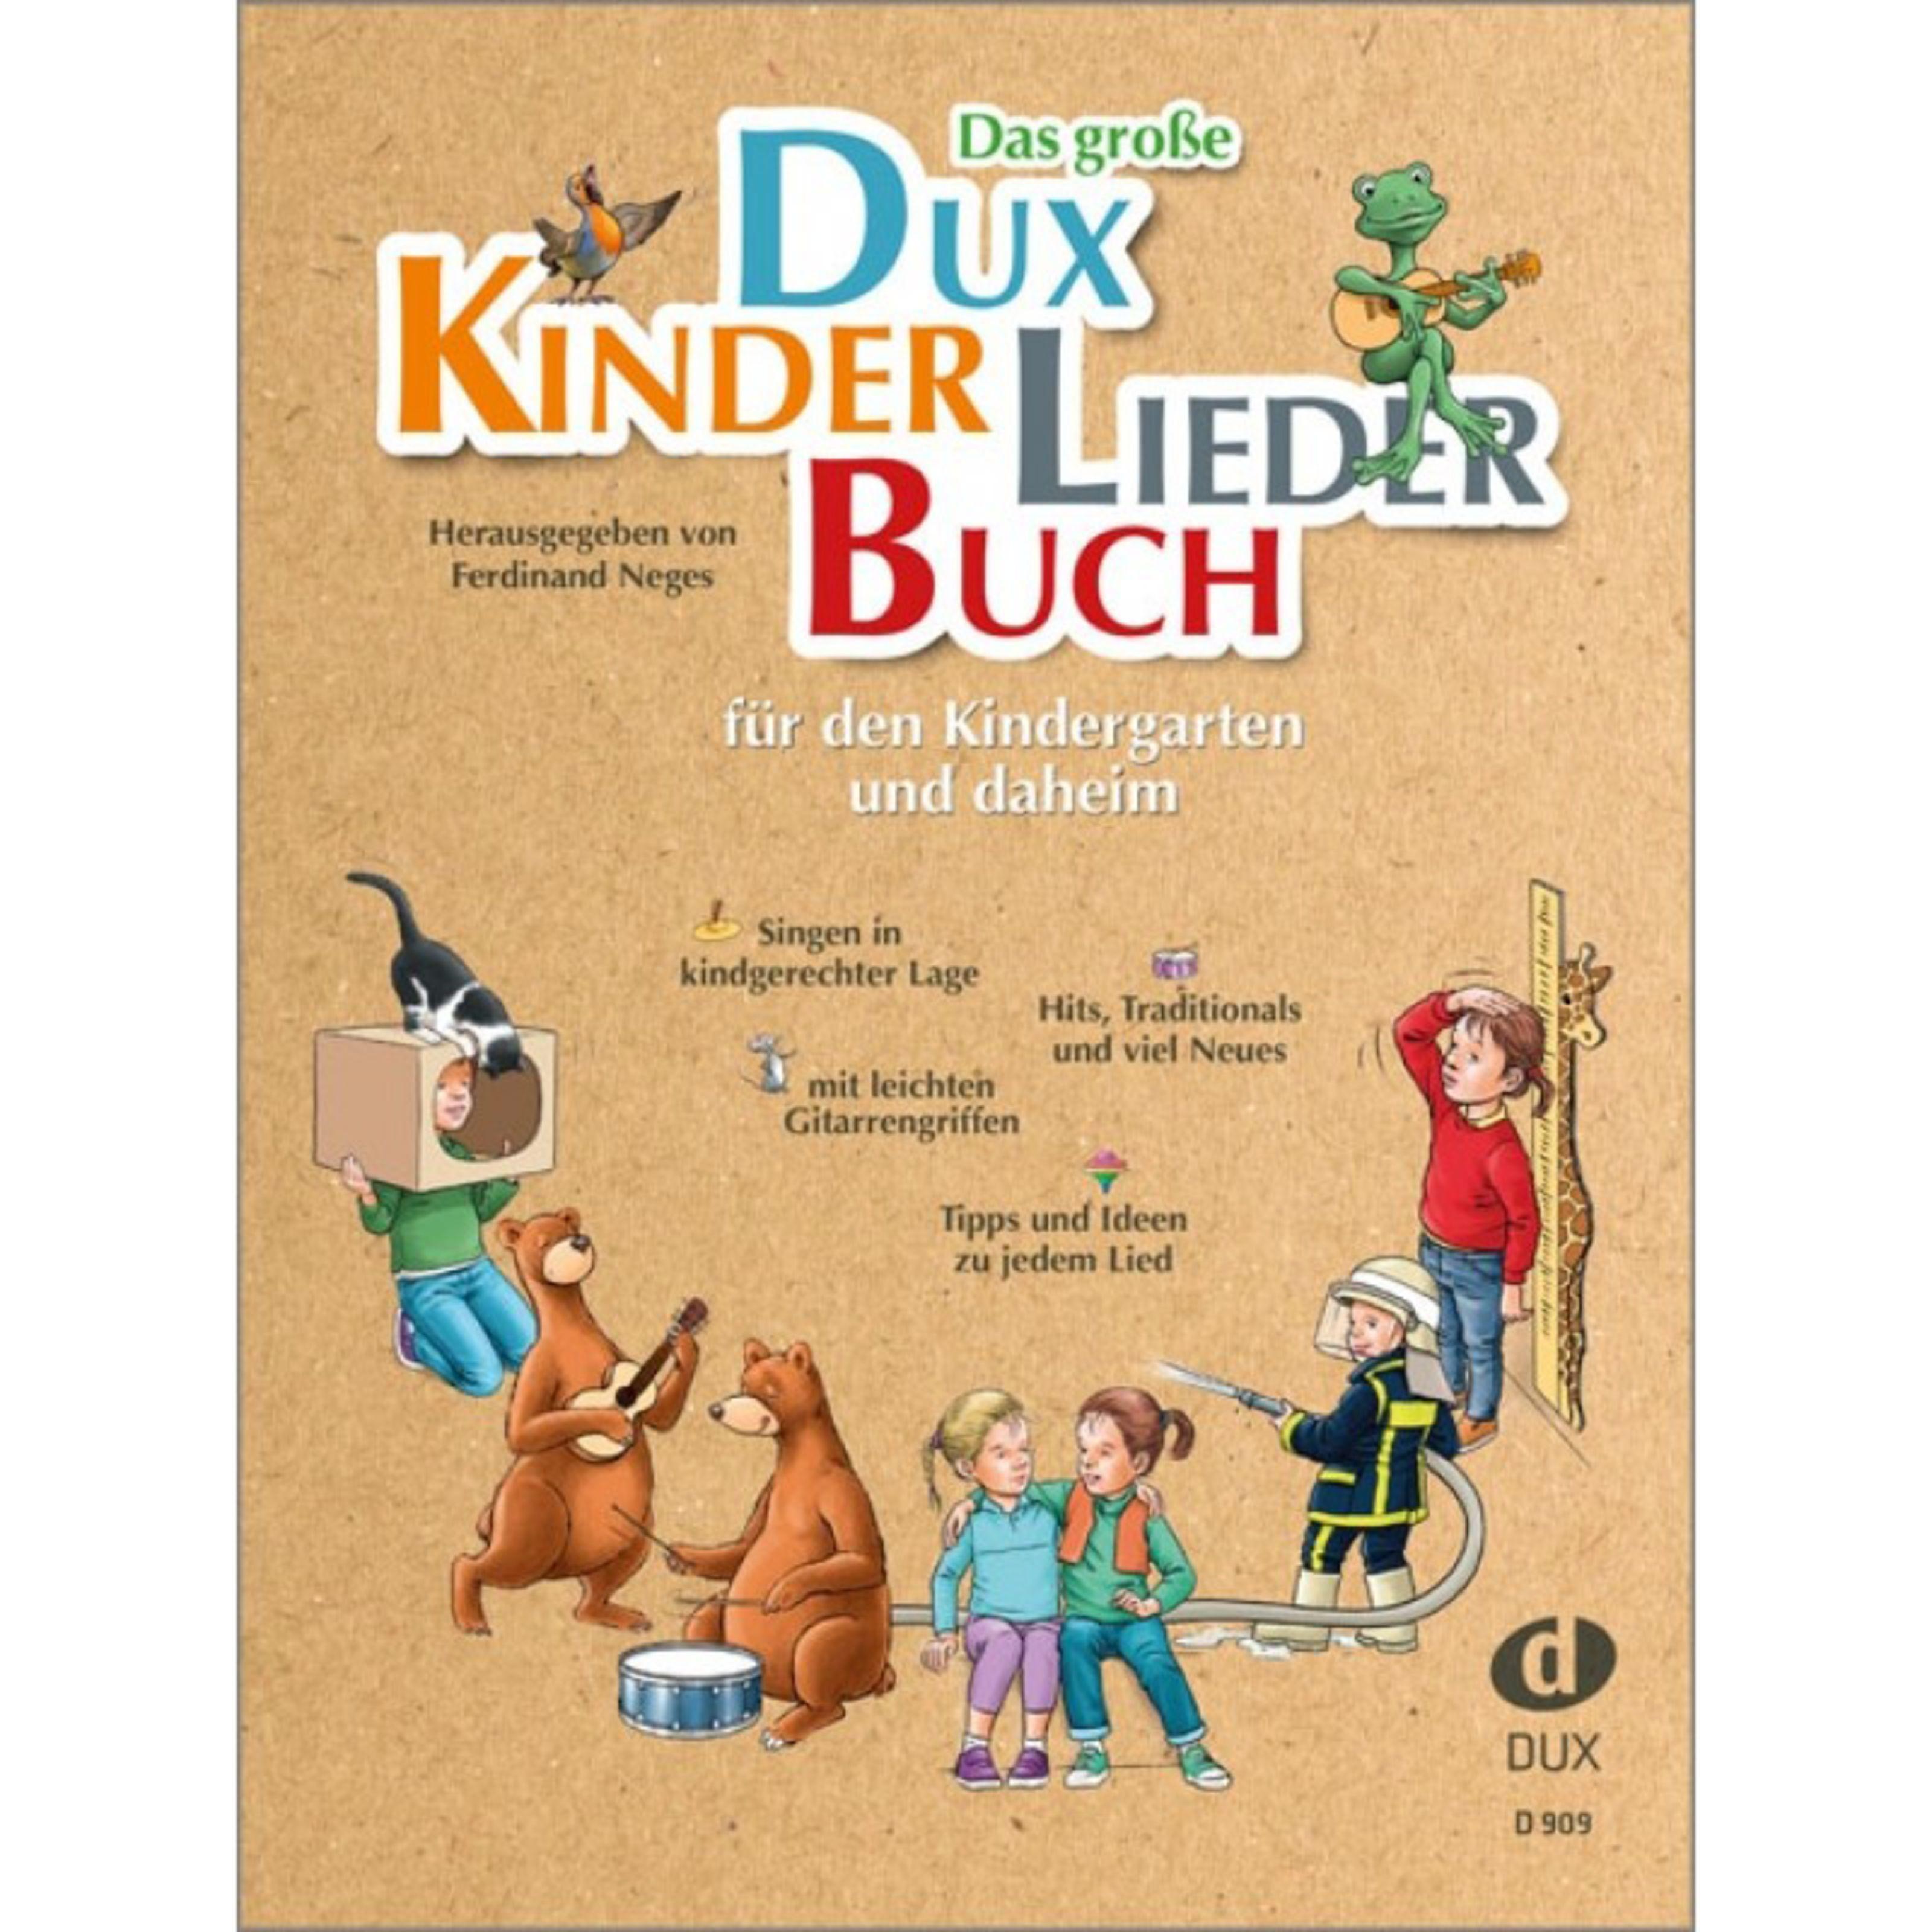 Edition Dux - Das große Dux-Kinderliederbuch D 909